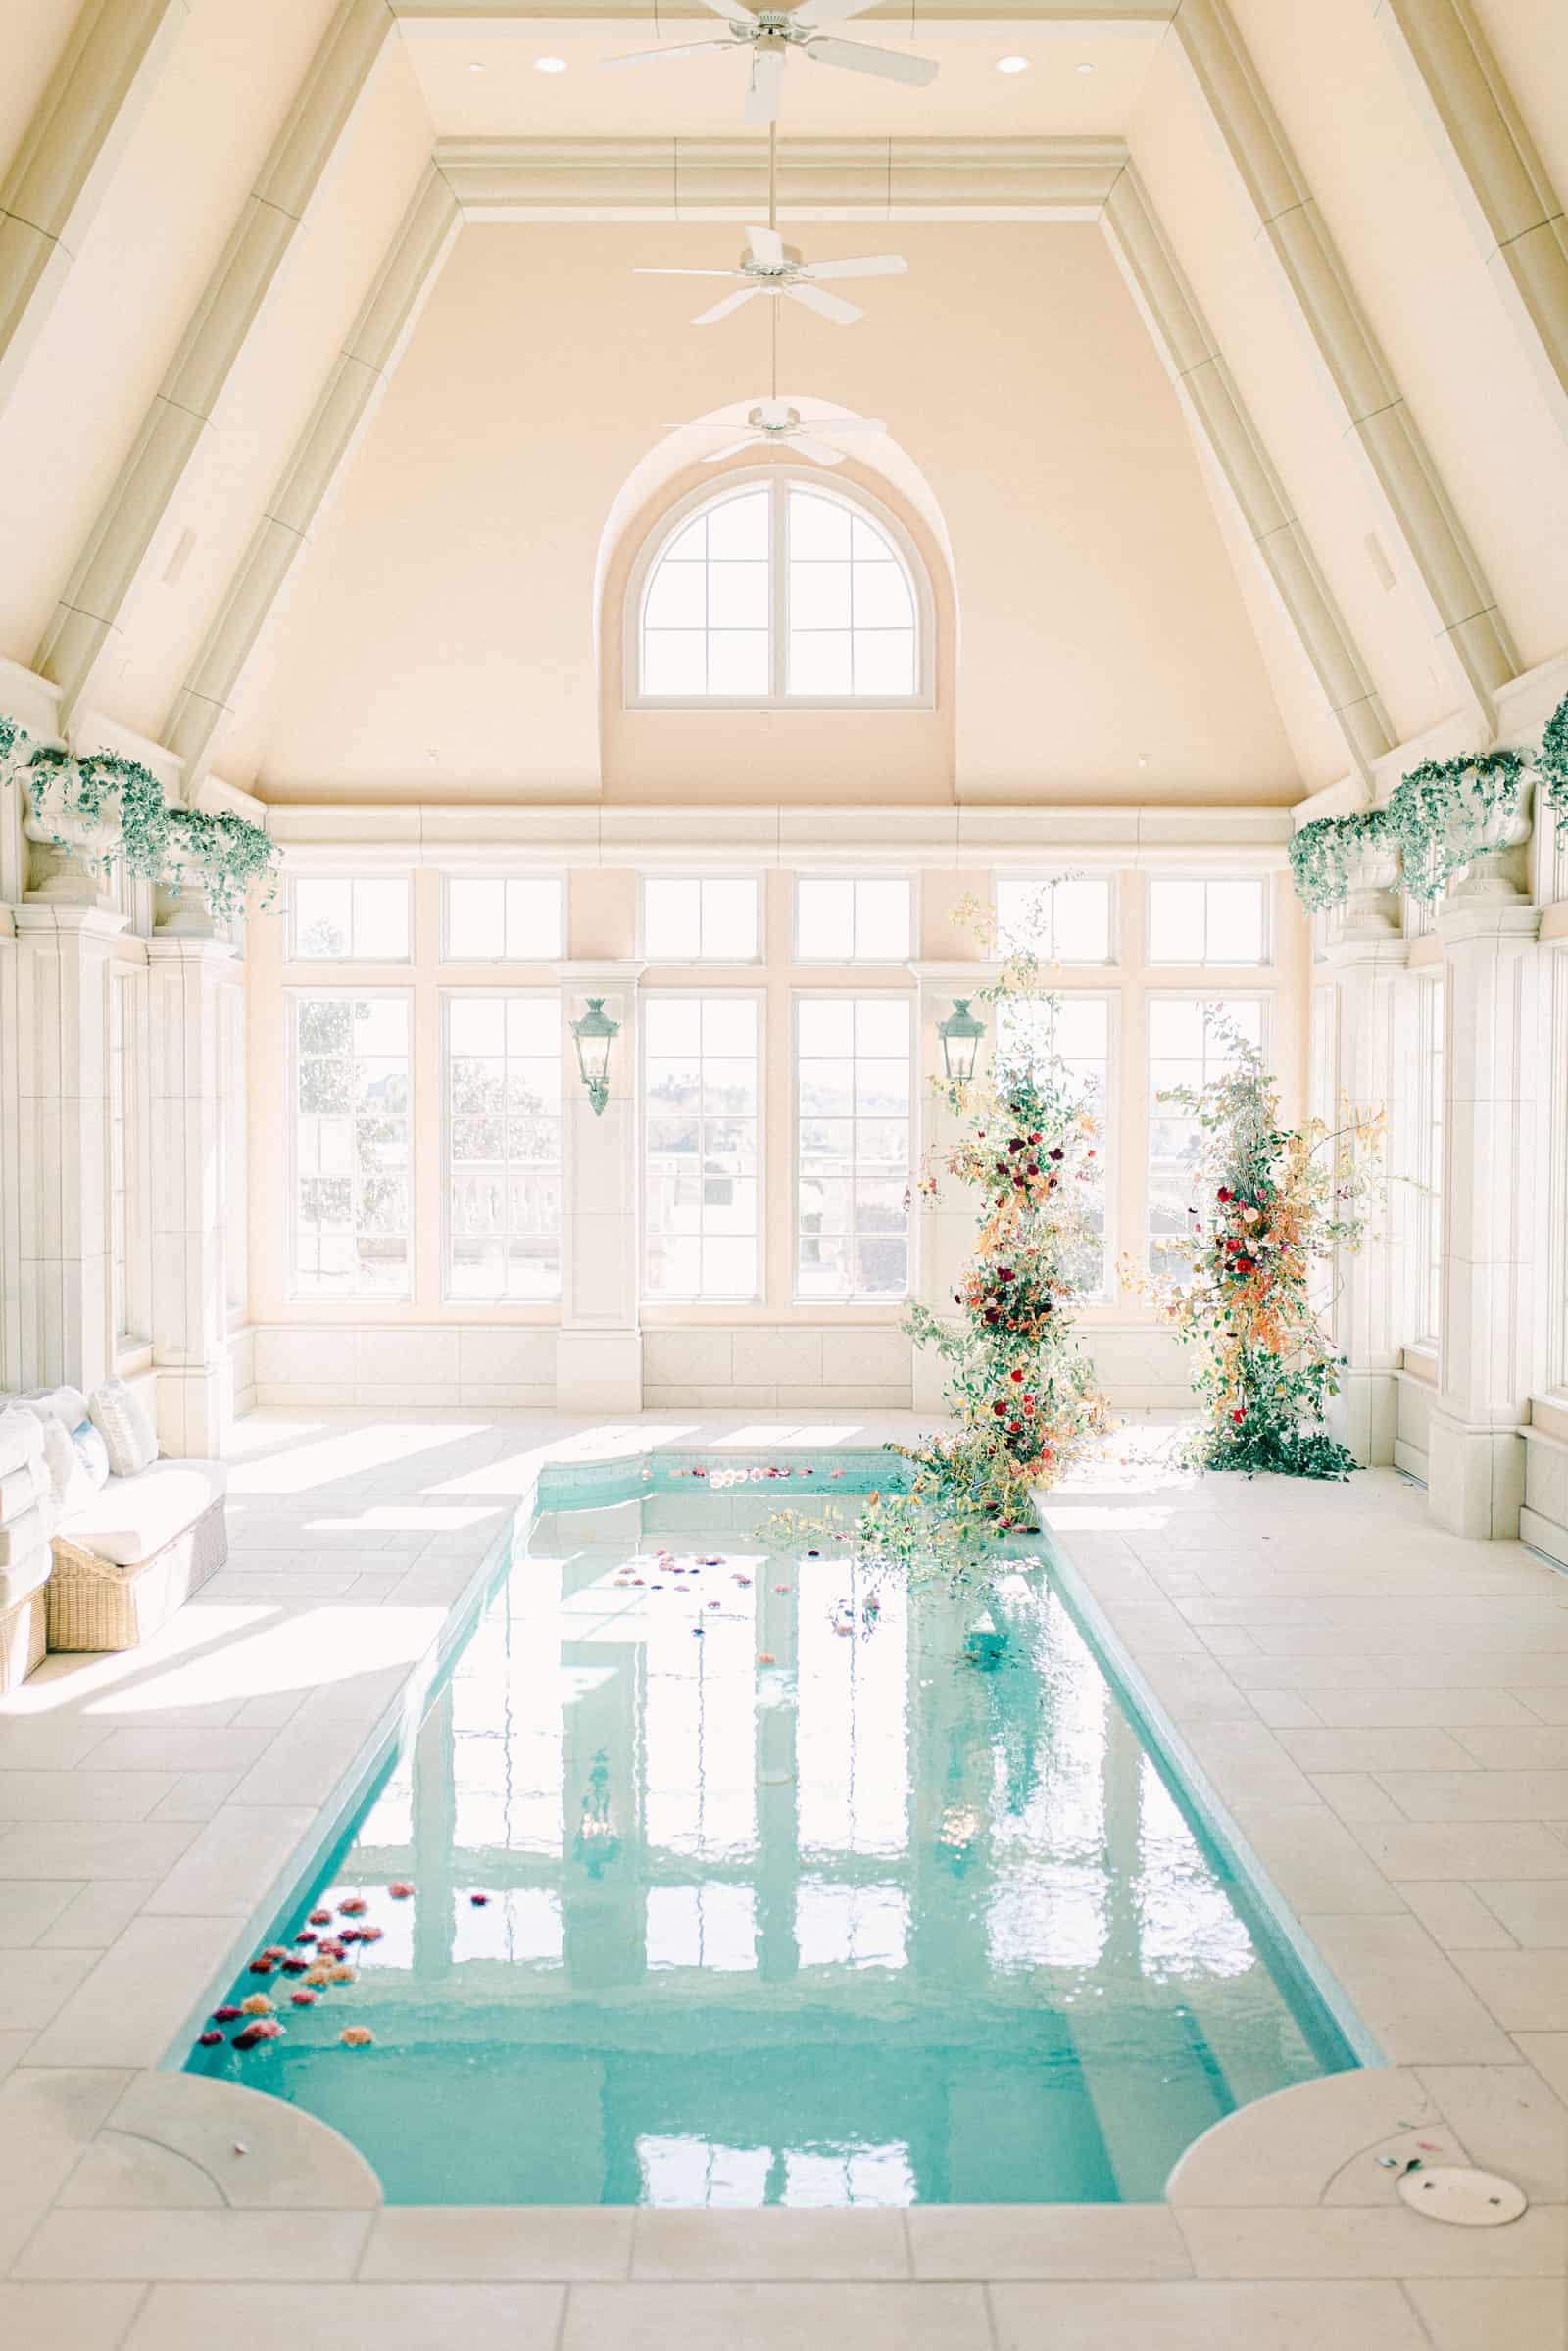 Elegant poolhouse wedding with floral ceremony backdrop